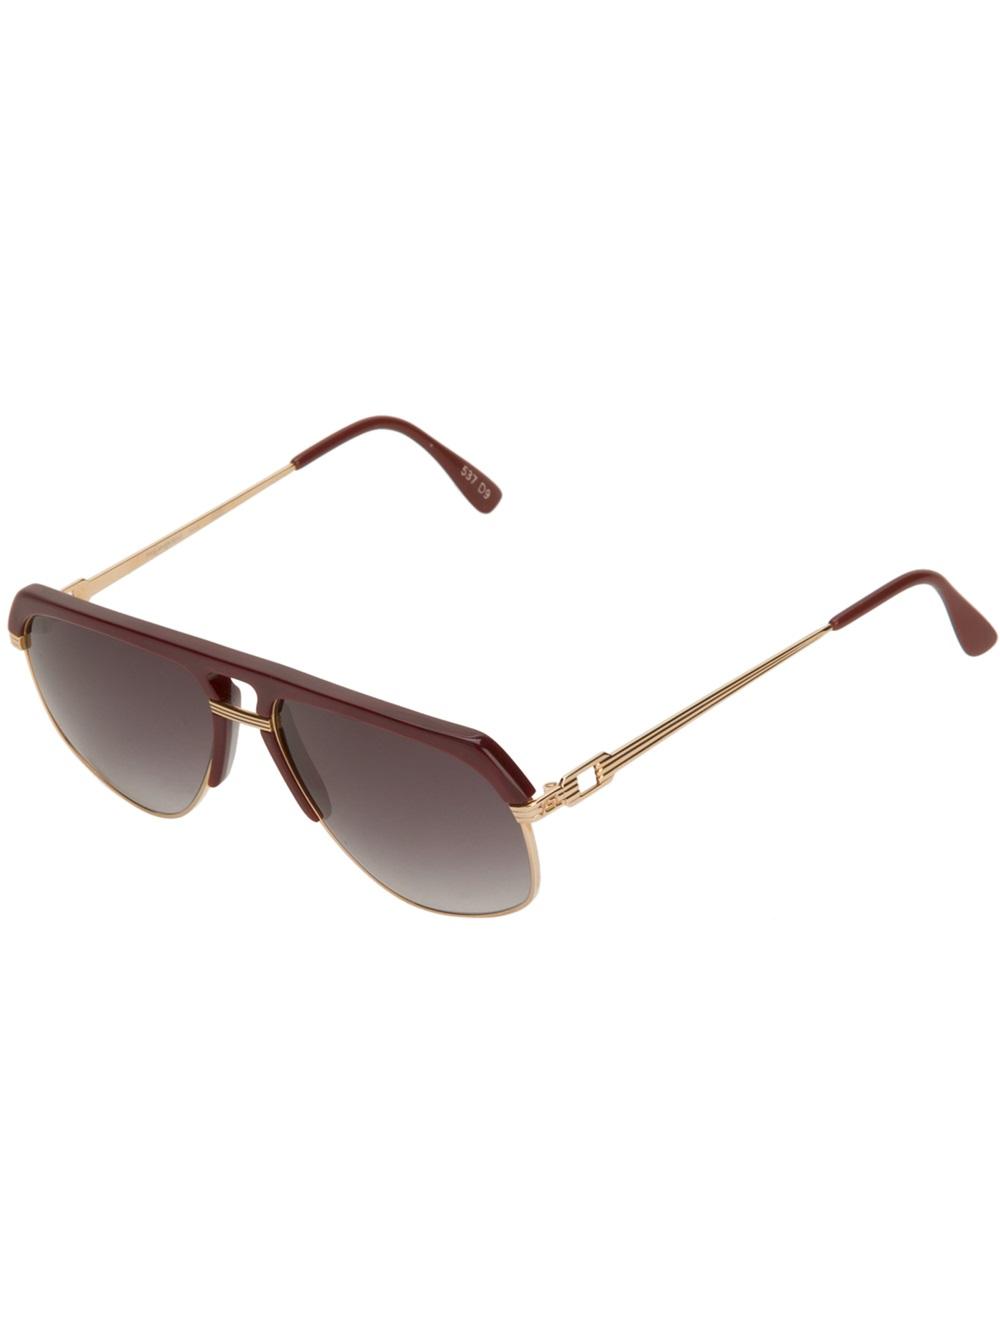 Yves Saint Laurent Mens Sunglasses 92